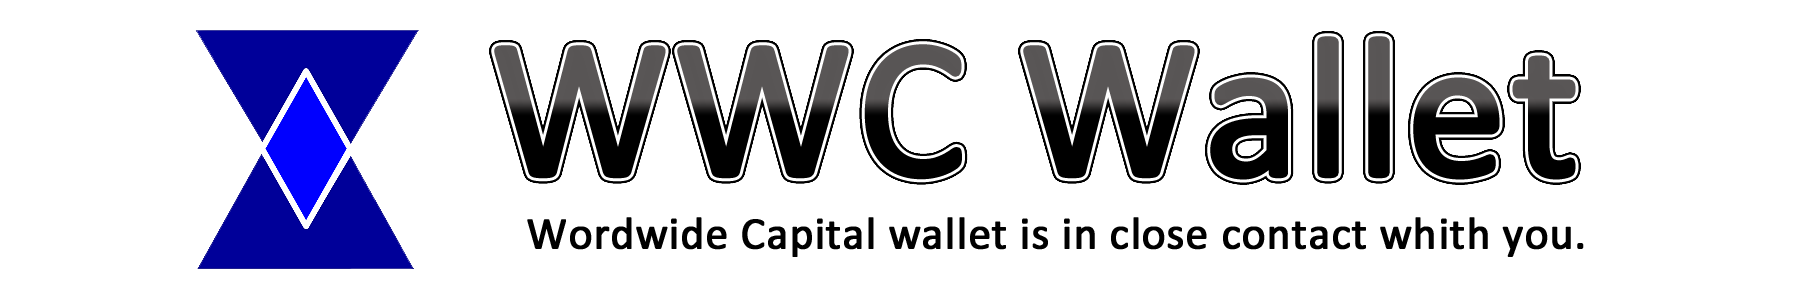 WWC Wallet